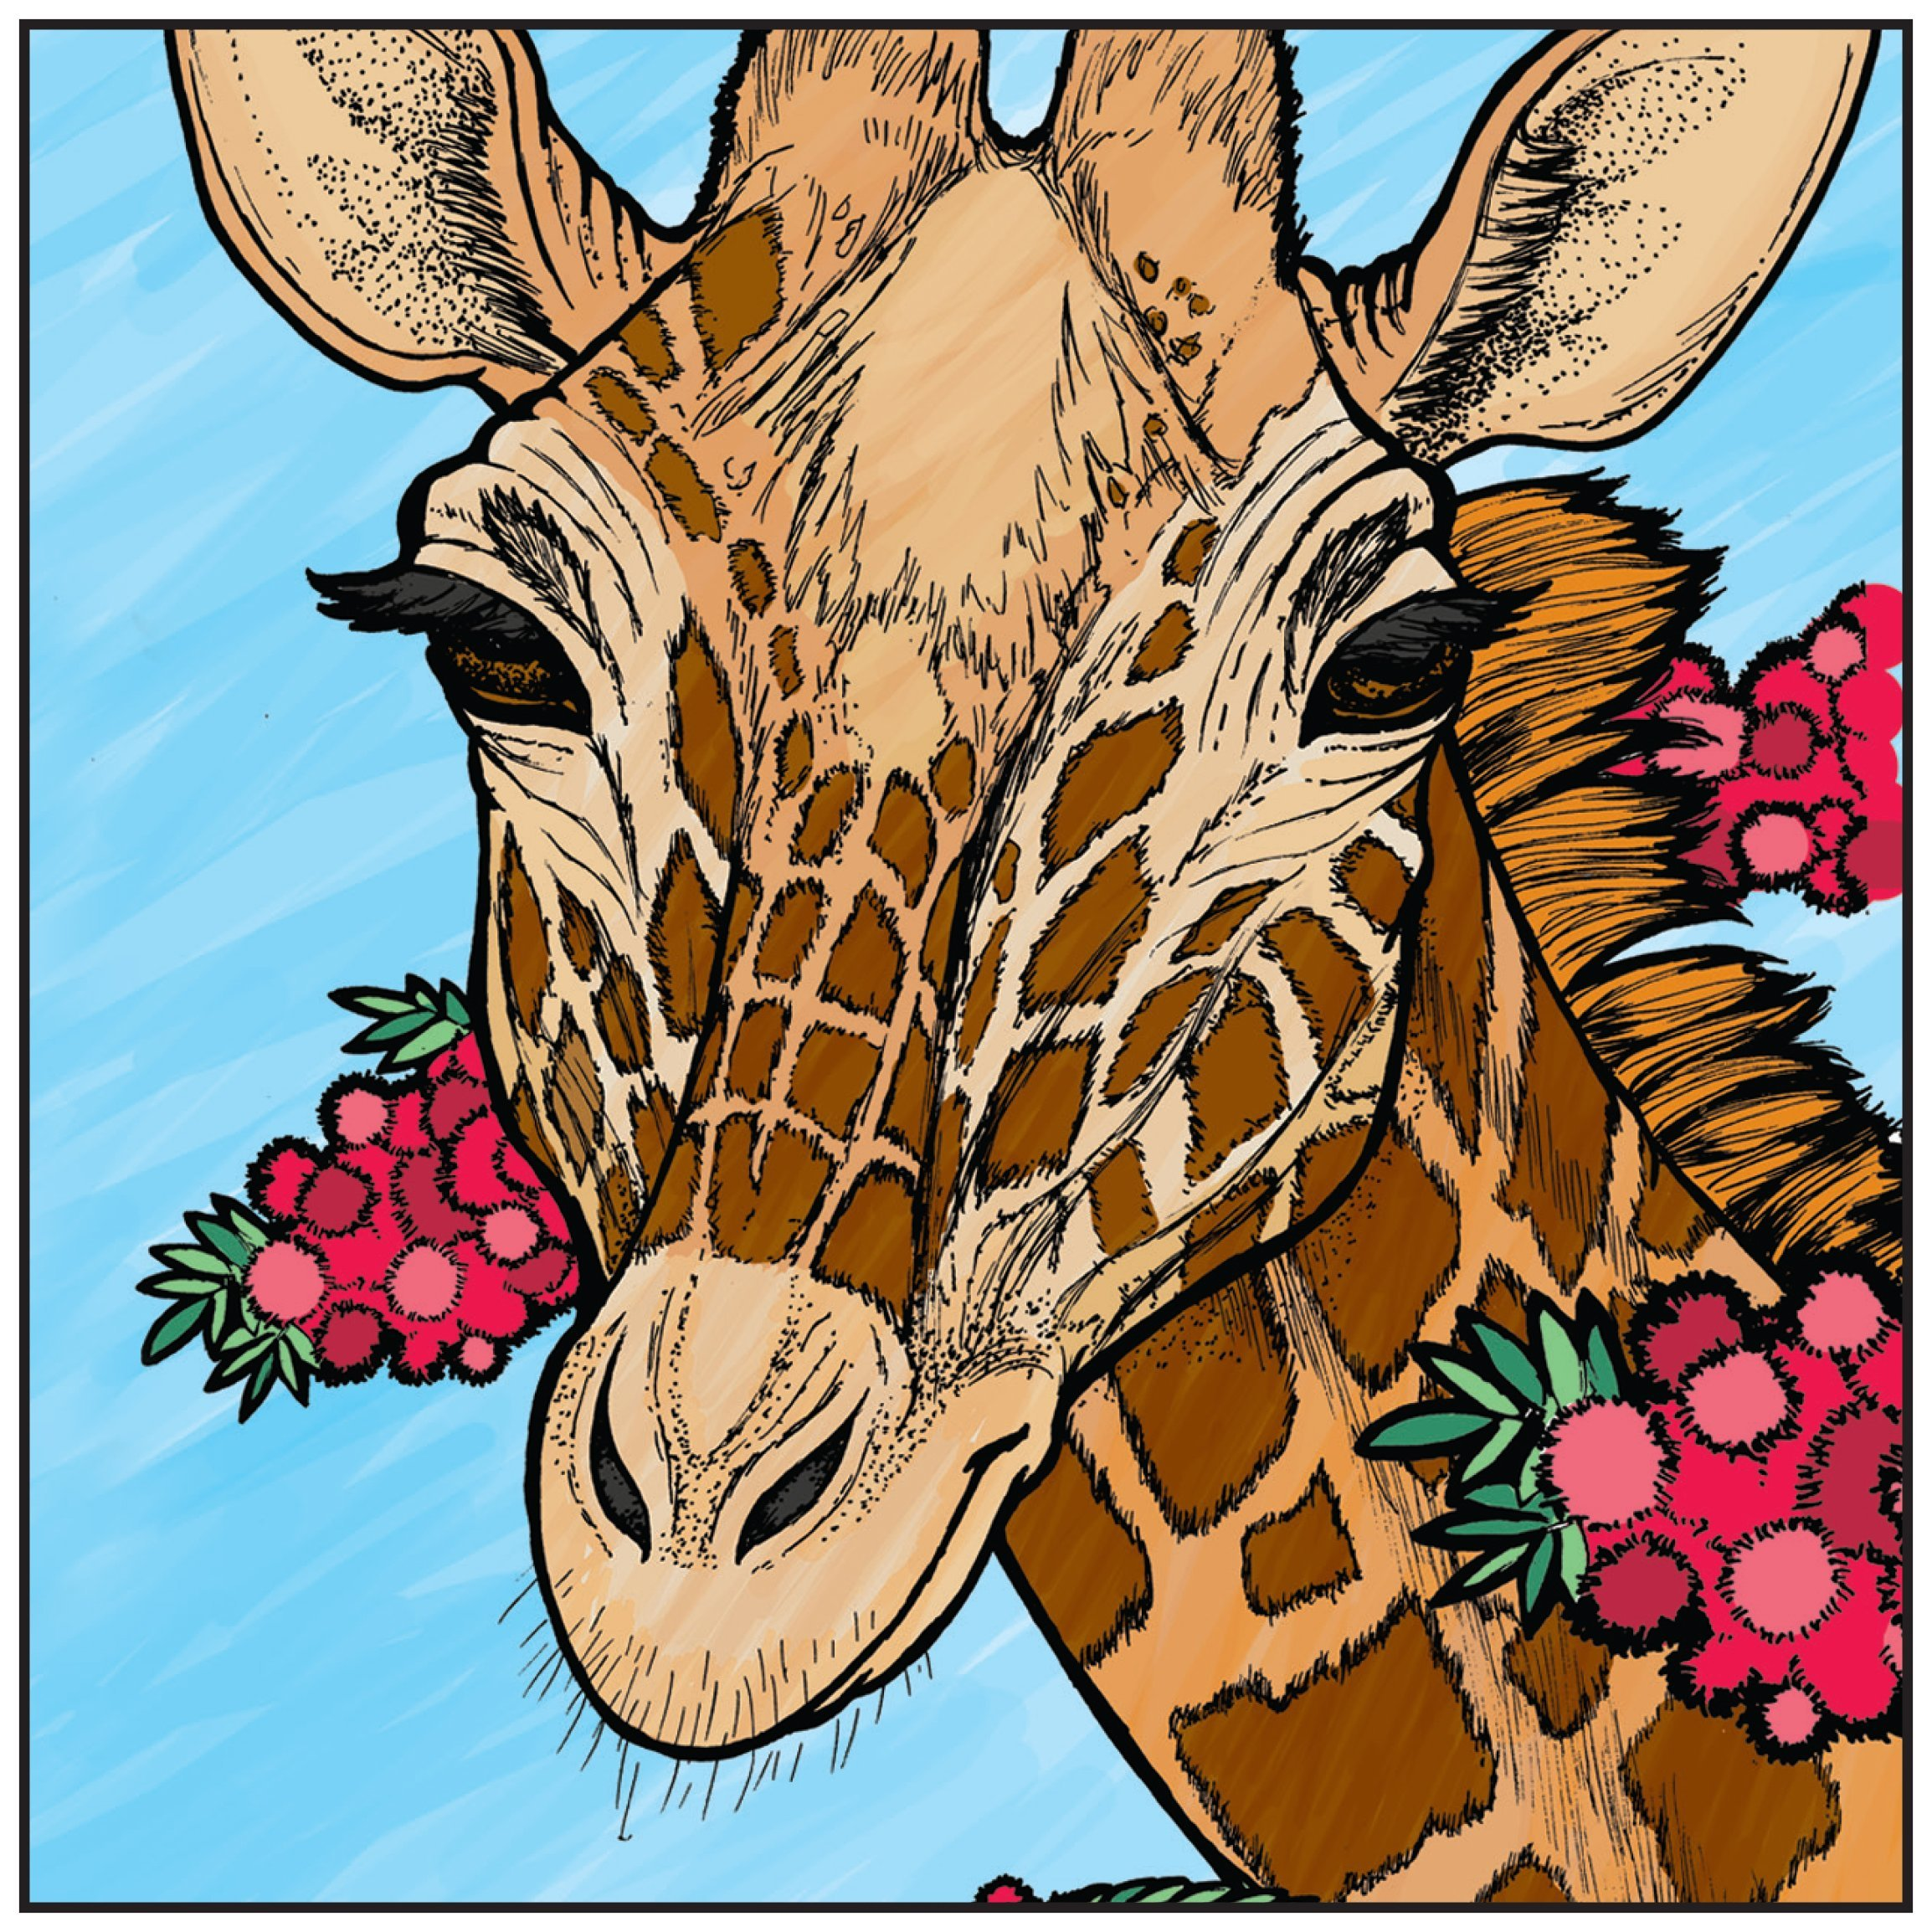 Amazon.com: Nature\'s Wonders Animal Adult Coloring Book With Bonus ...